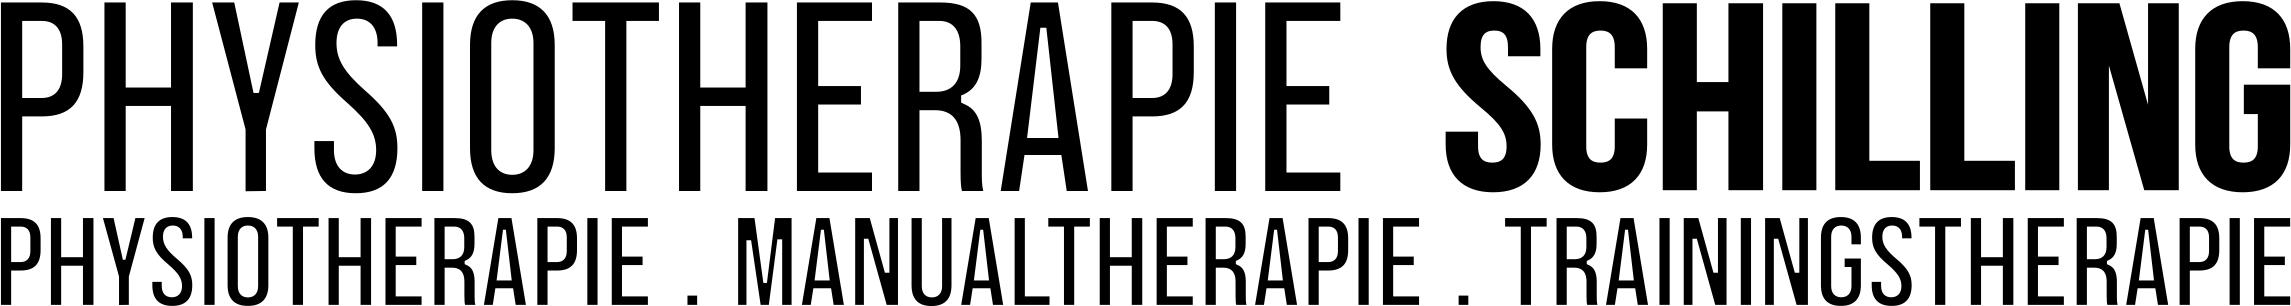 physio_schilling_logo